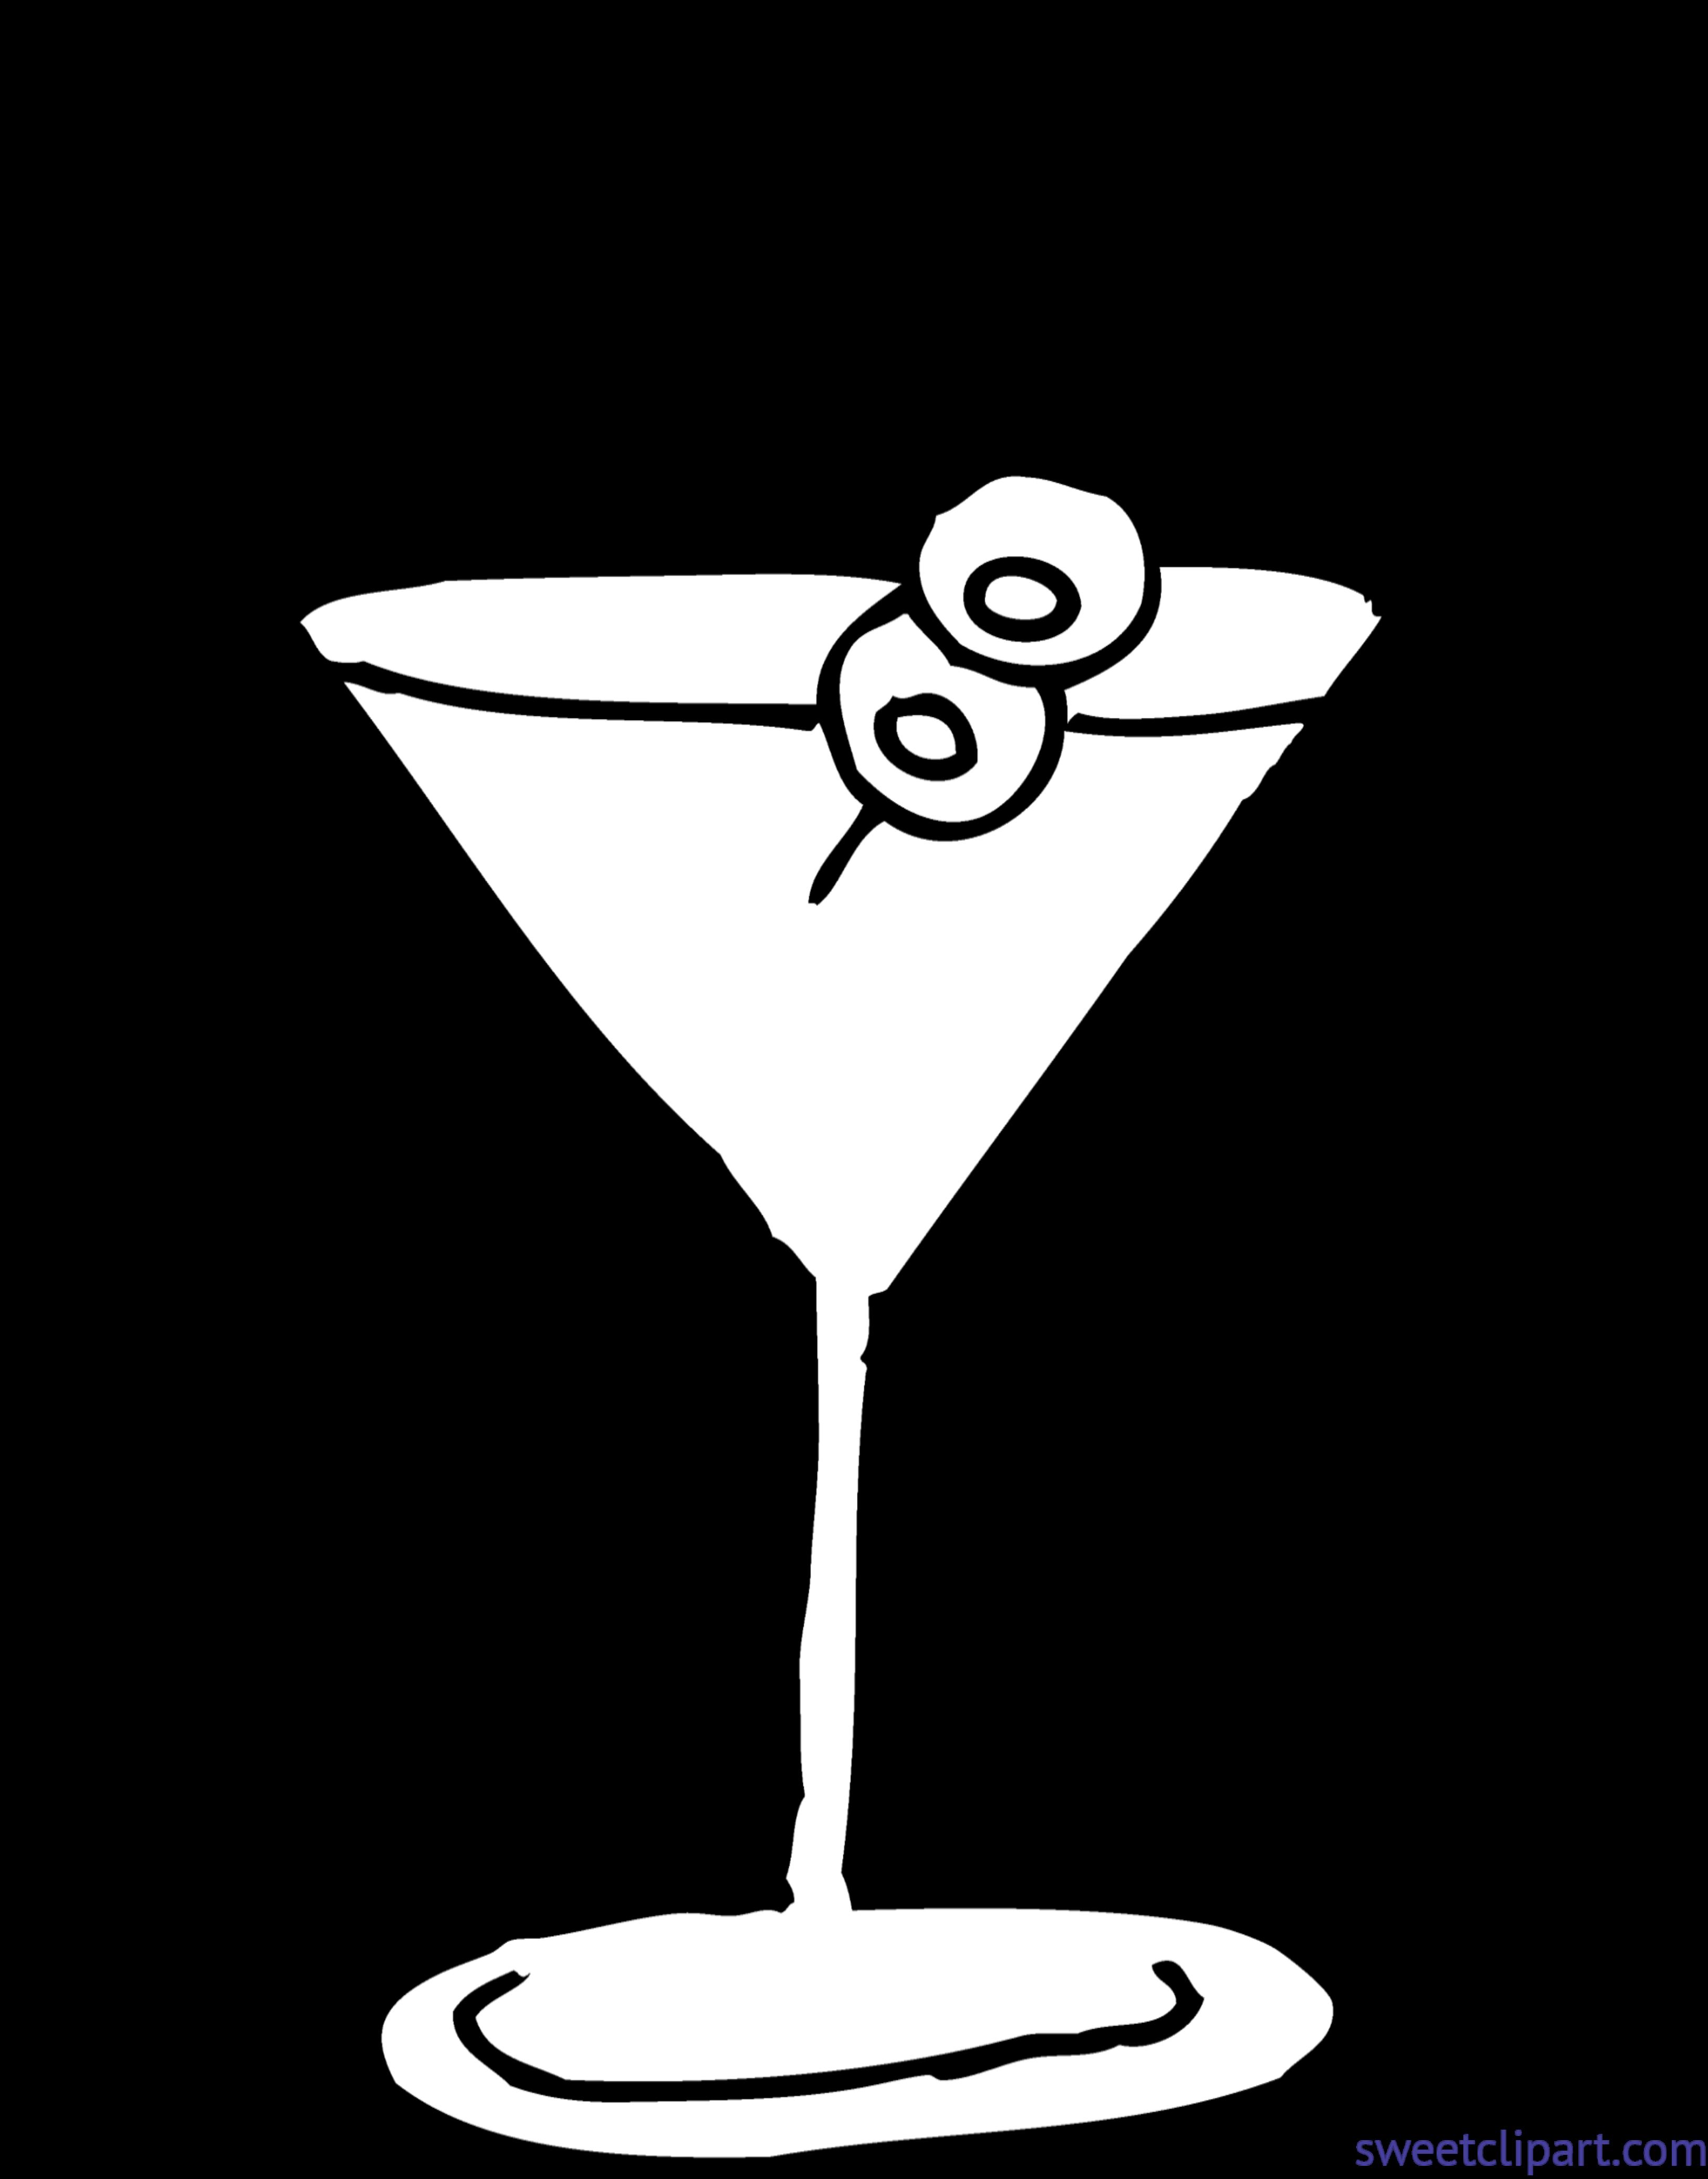 Martini drawing at getdrawings. Hair clipart glass